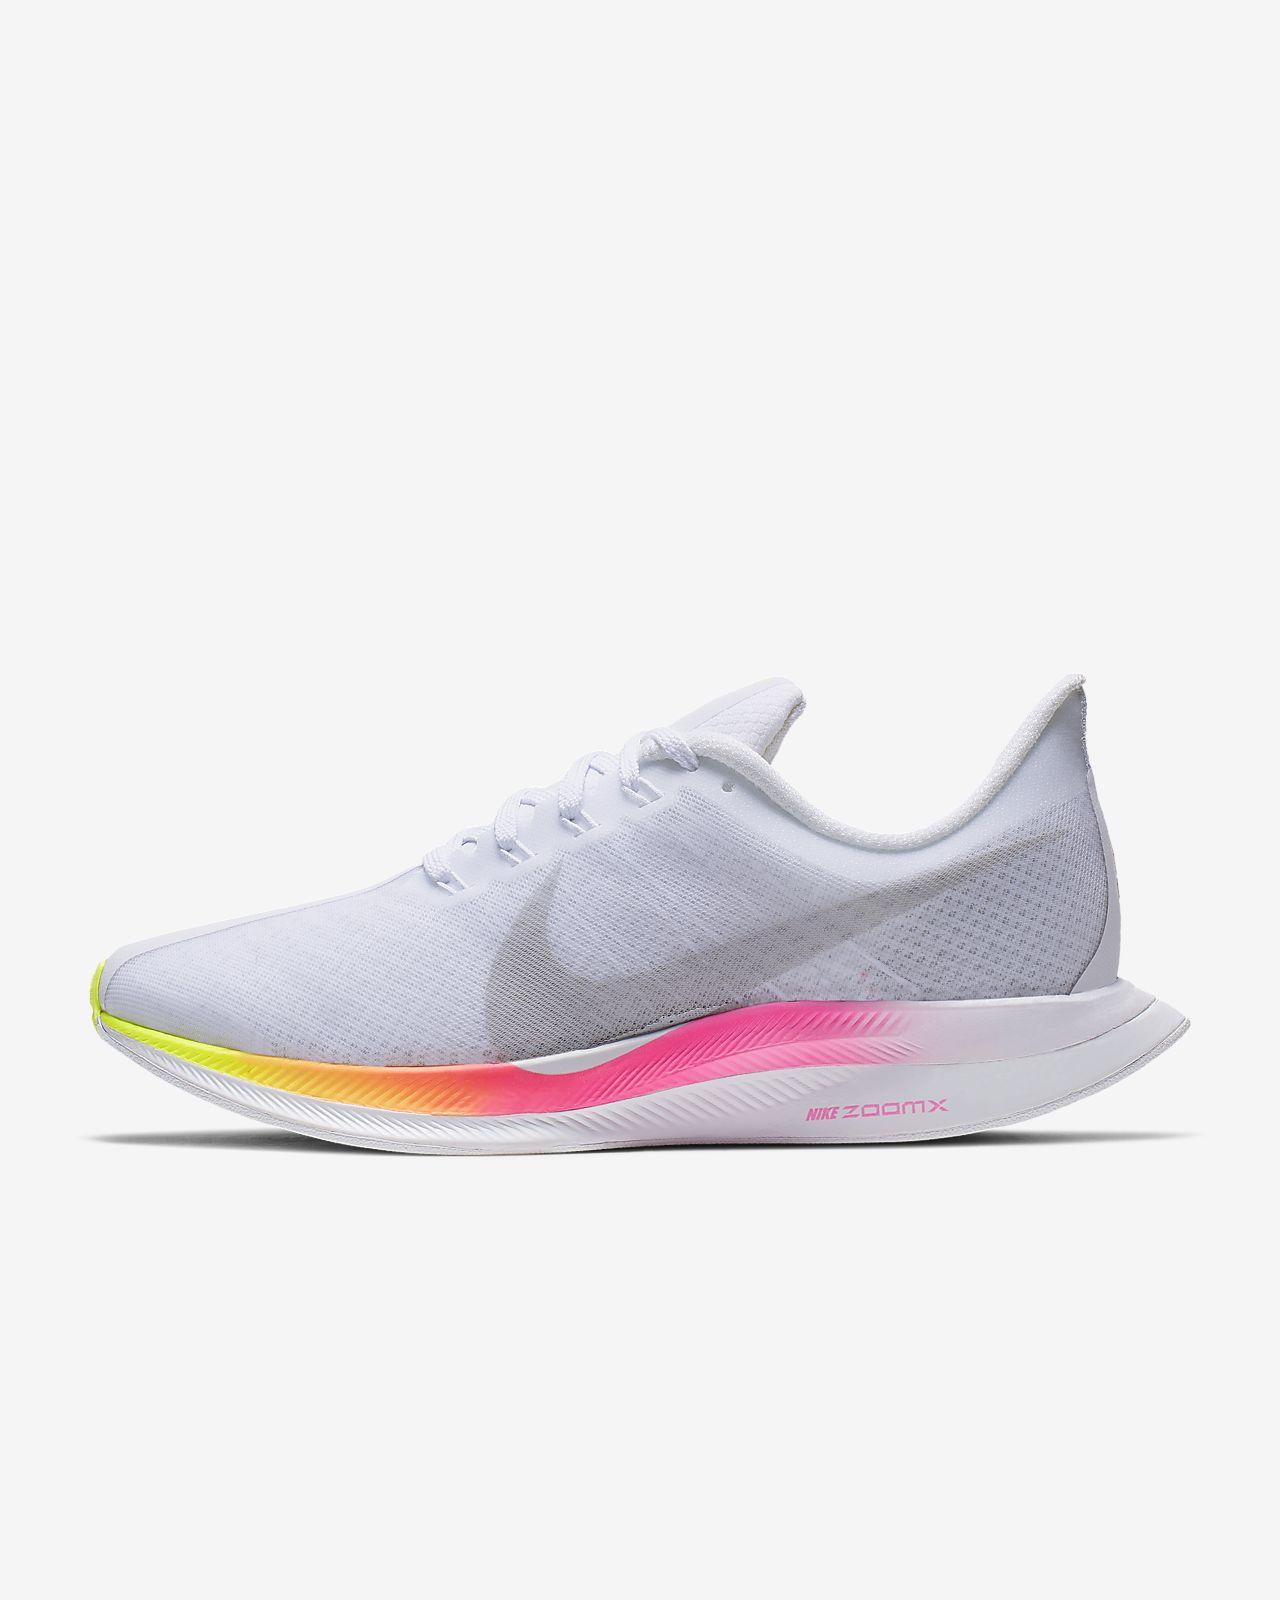 7963a63ead8 Calzado de running para mujer Nike Zoom Pegasus 35 Turbo. Nike.com CL